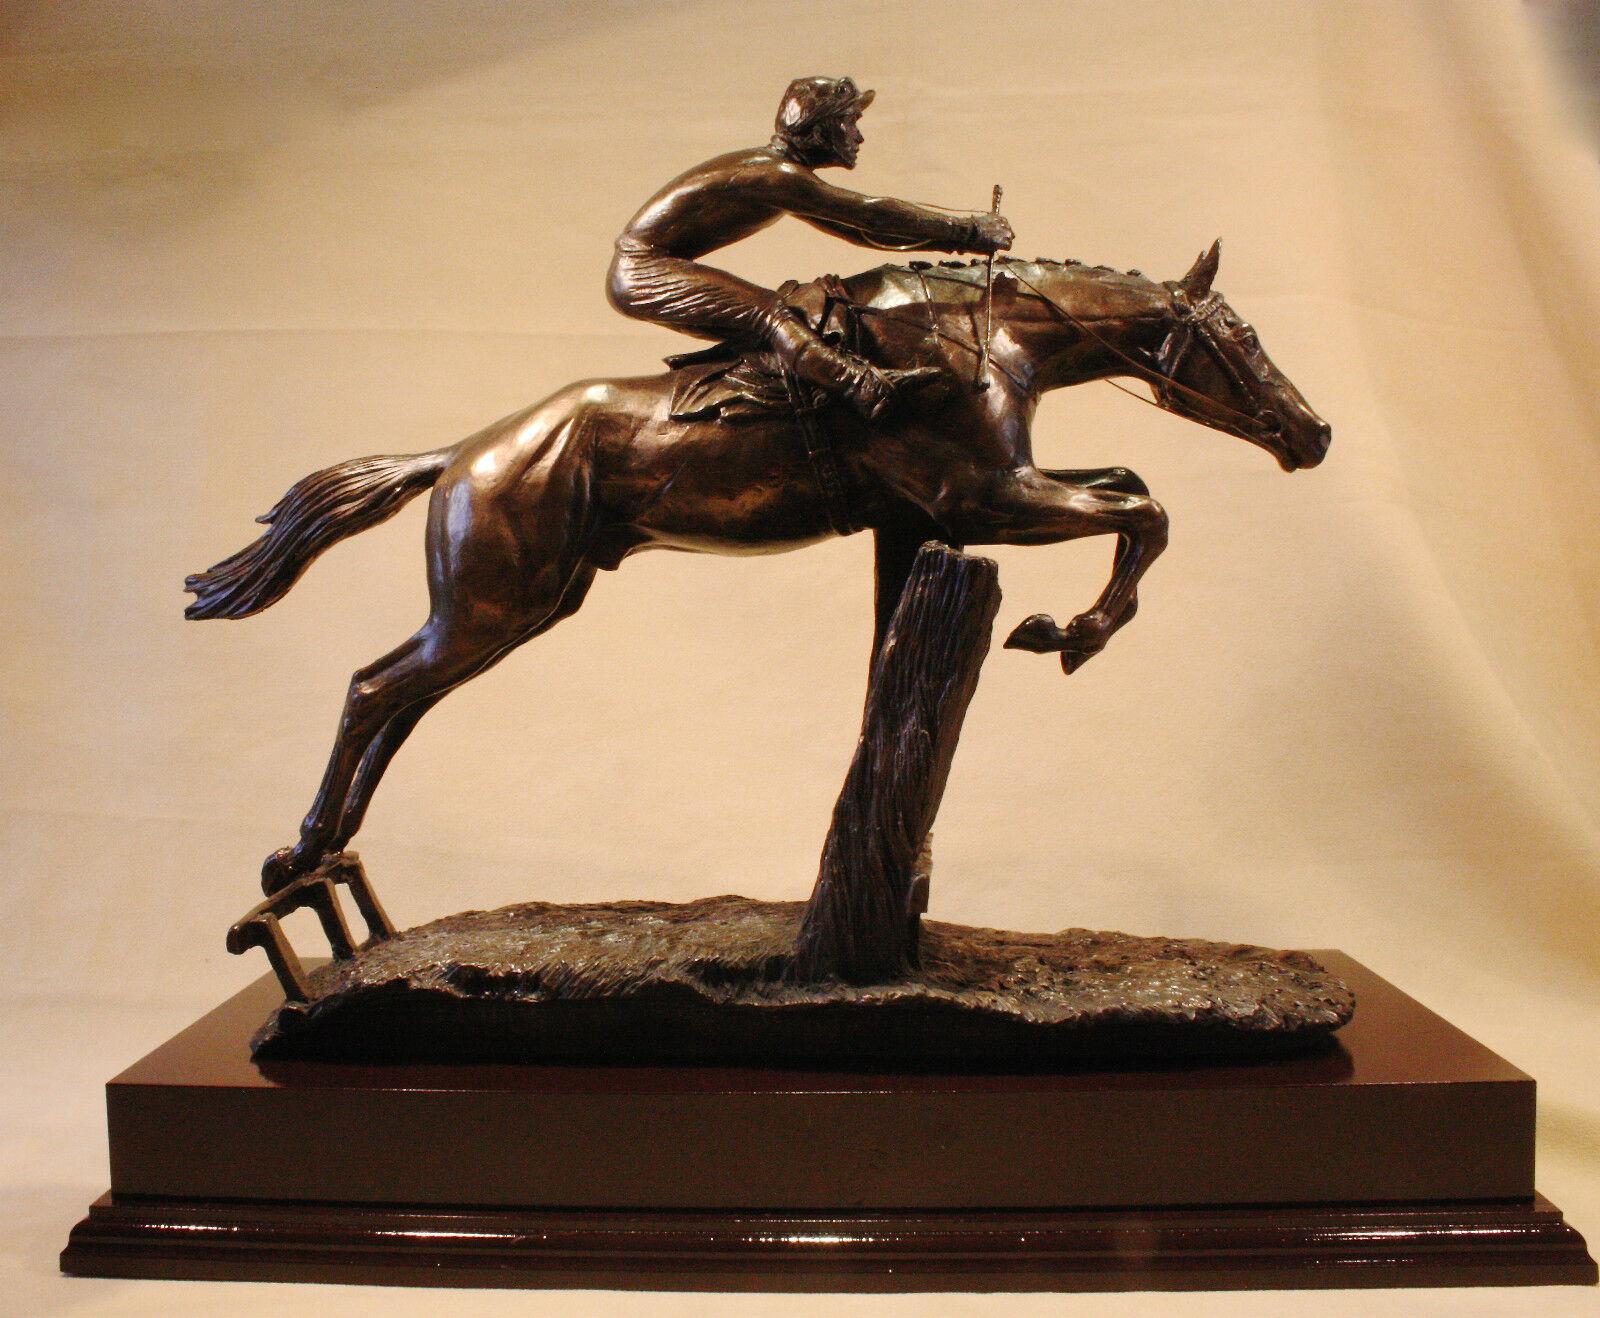 At Full Stretch - Bronze Trophy Sculpture - David Geenty